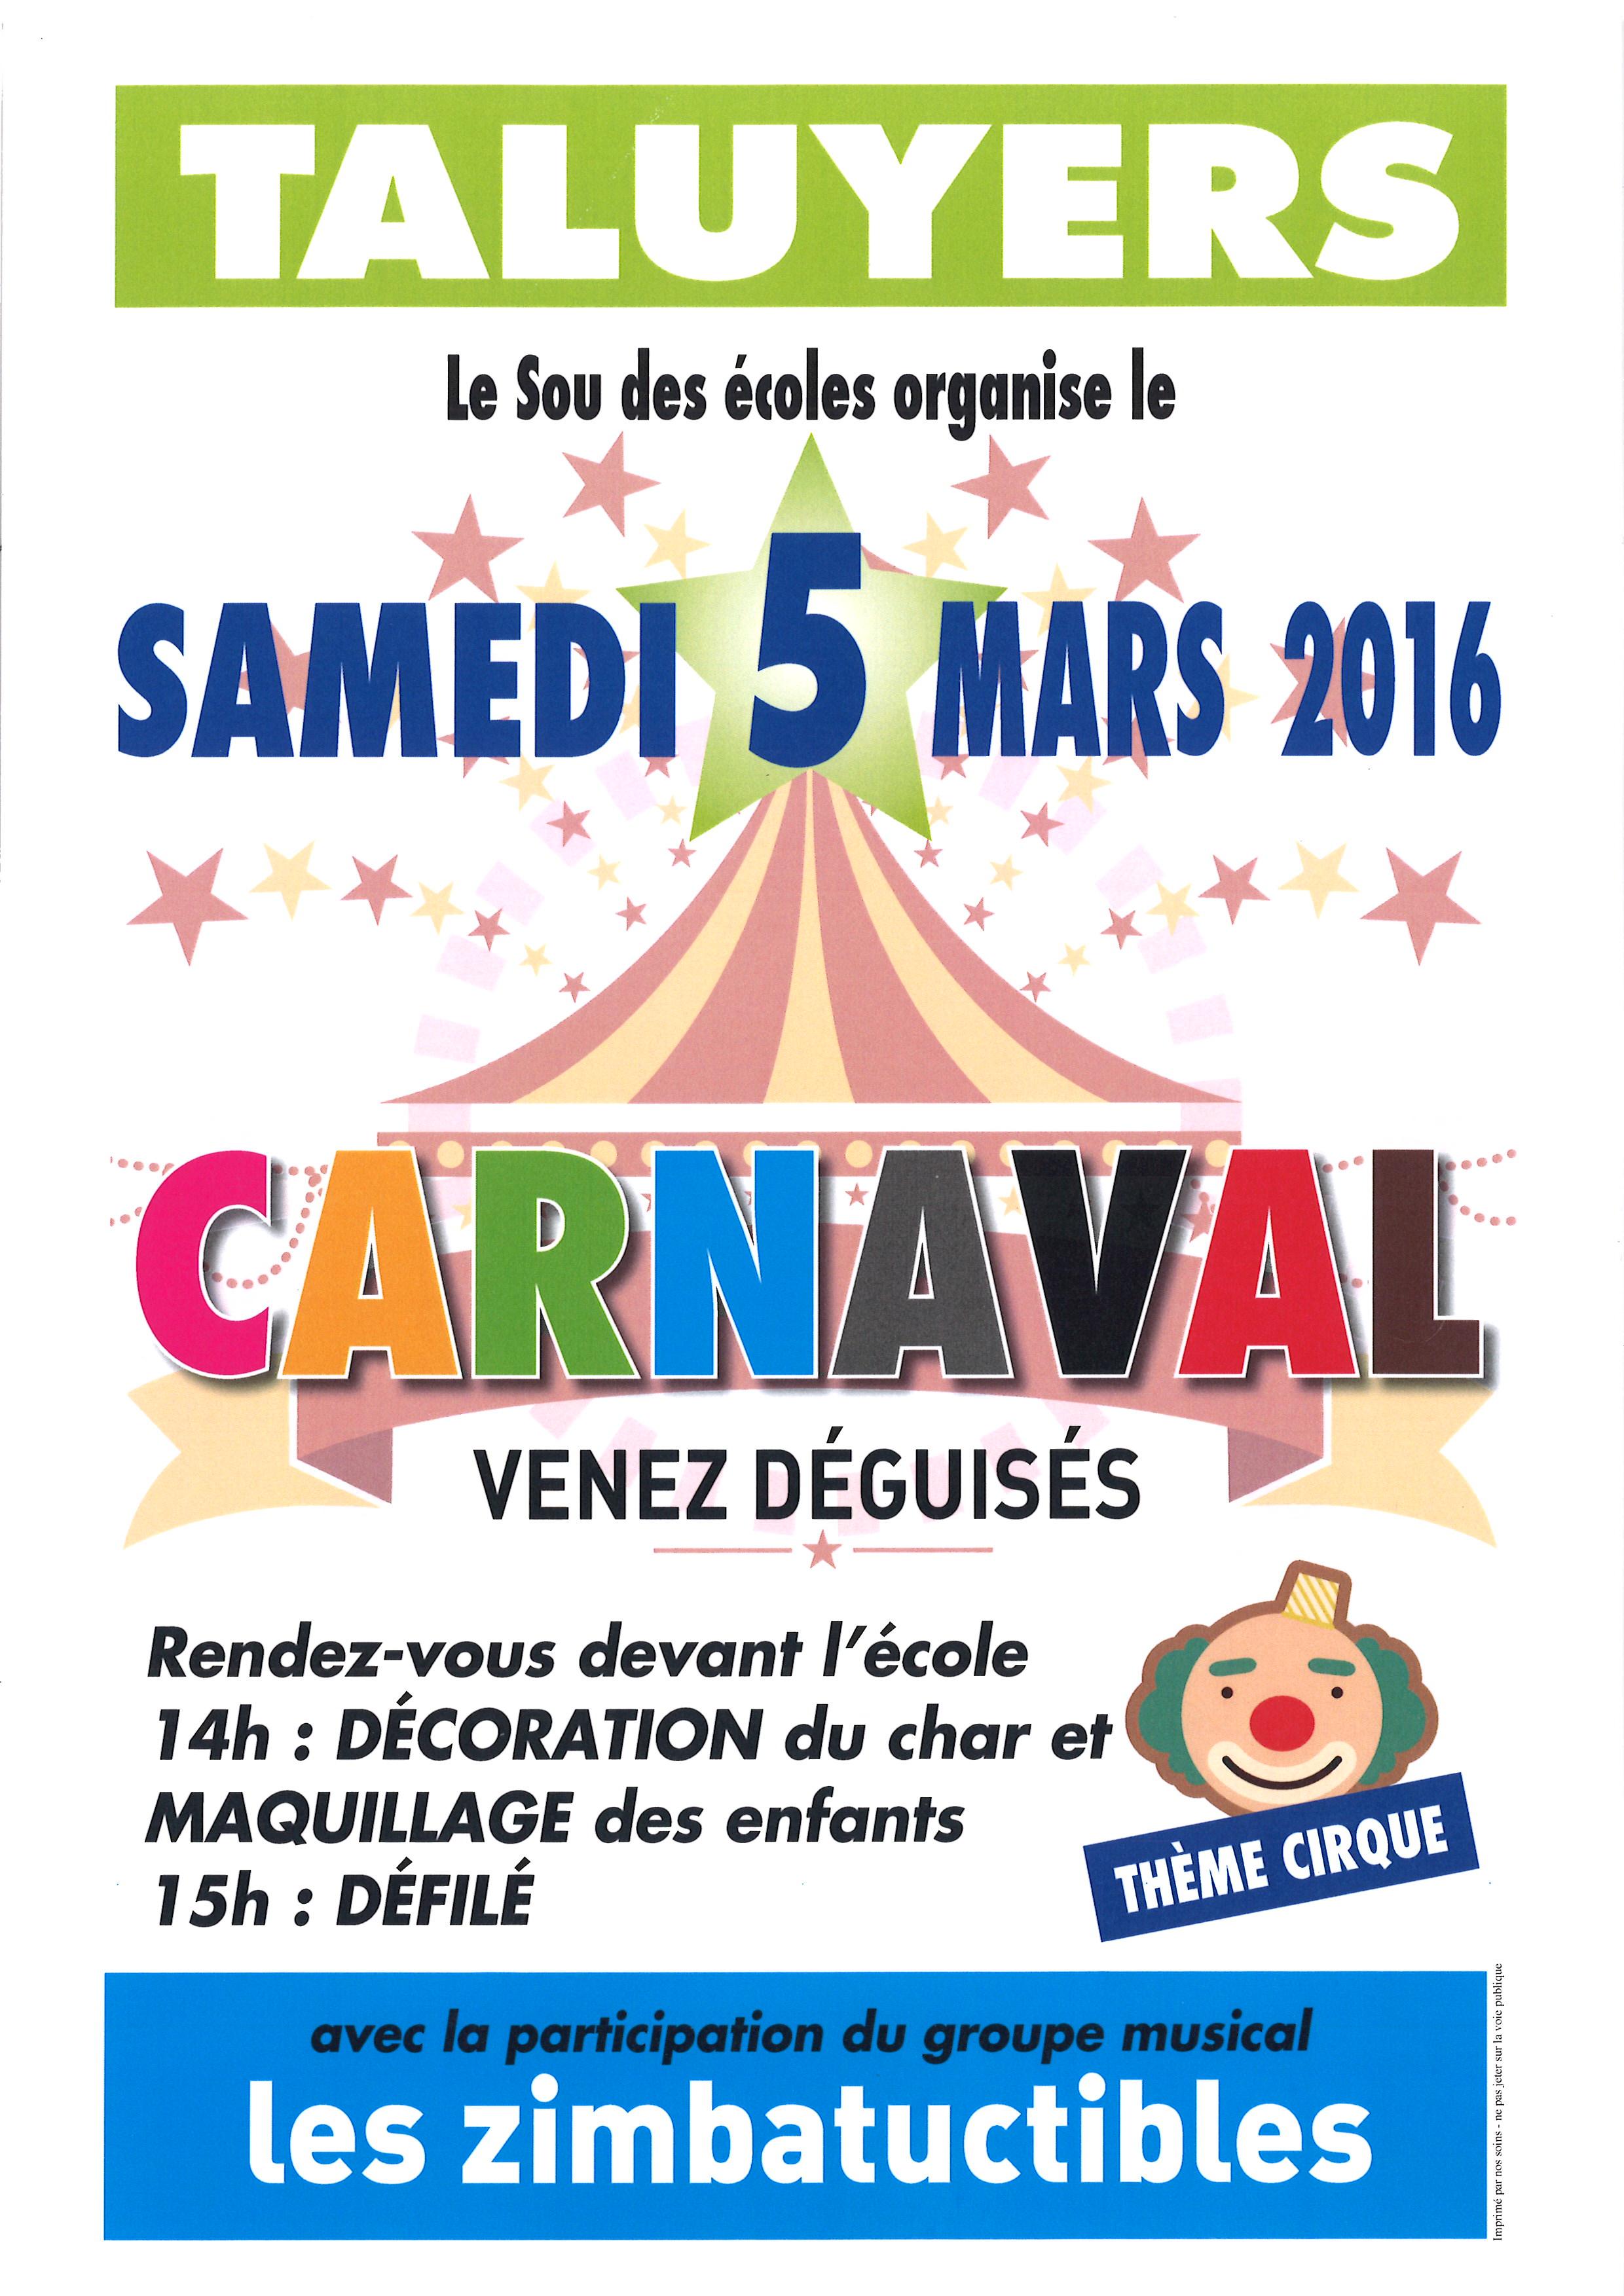 Carnaval le 5 mars